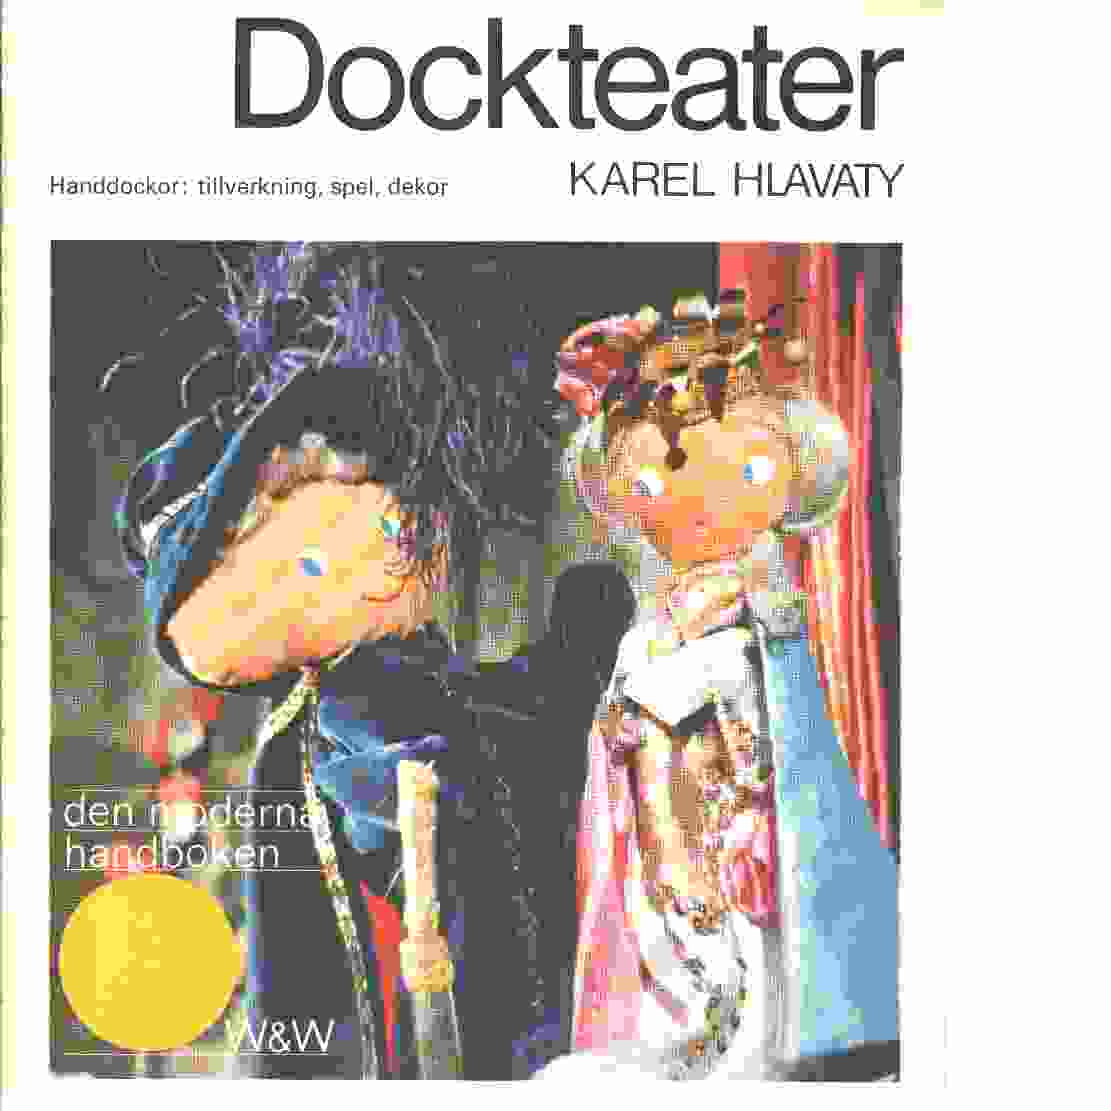 Dockteater - Hlavaty, Karel